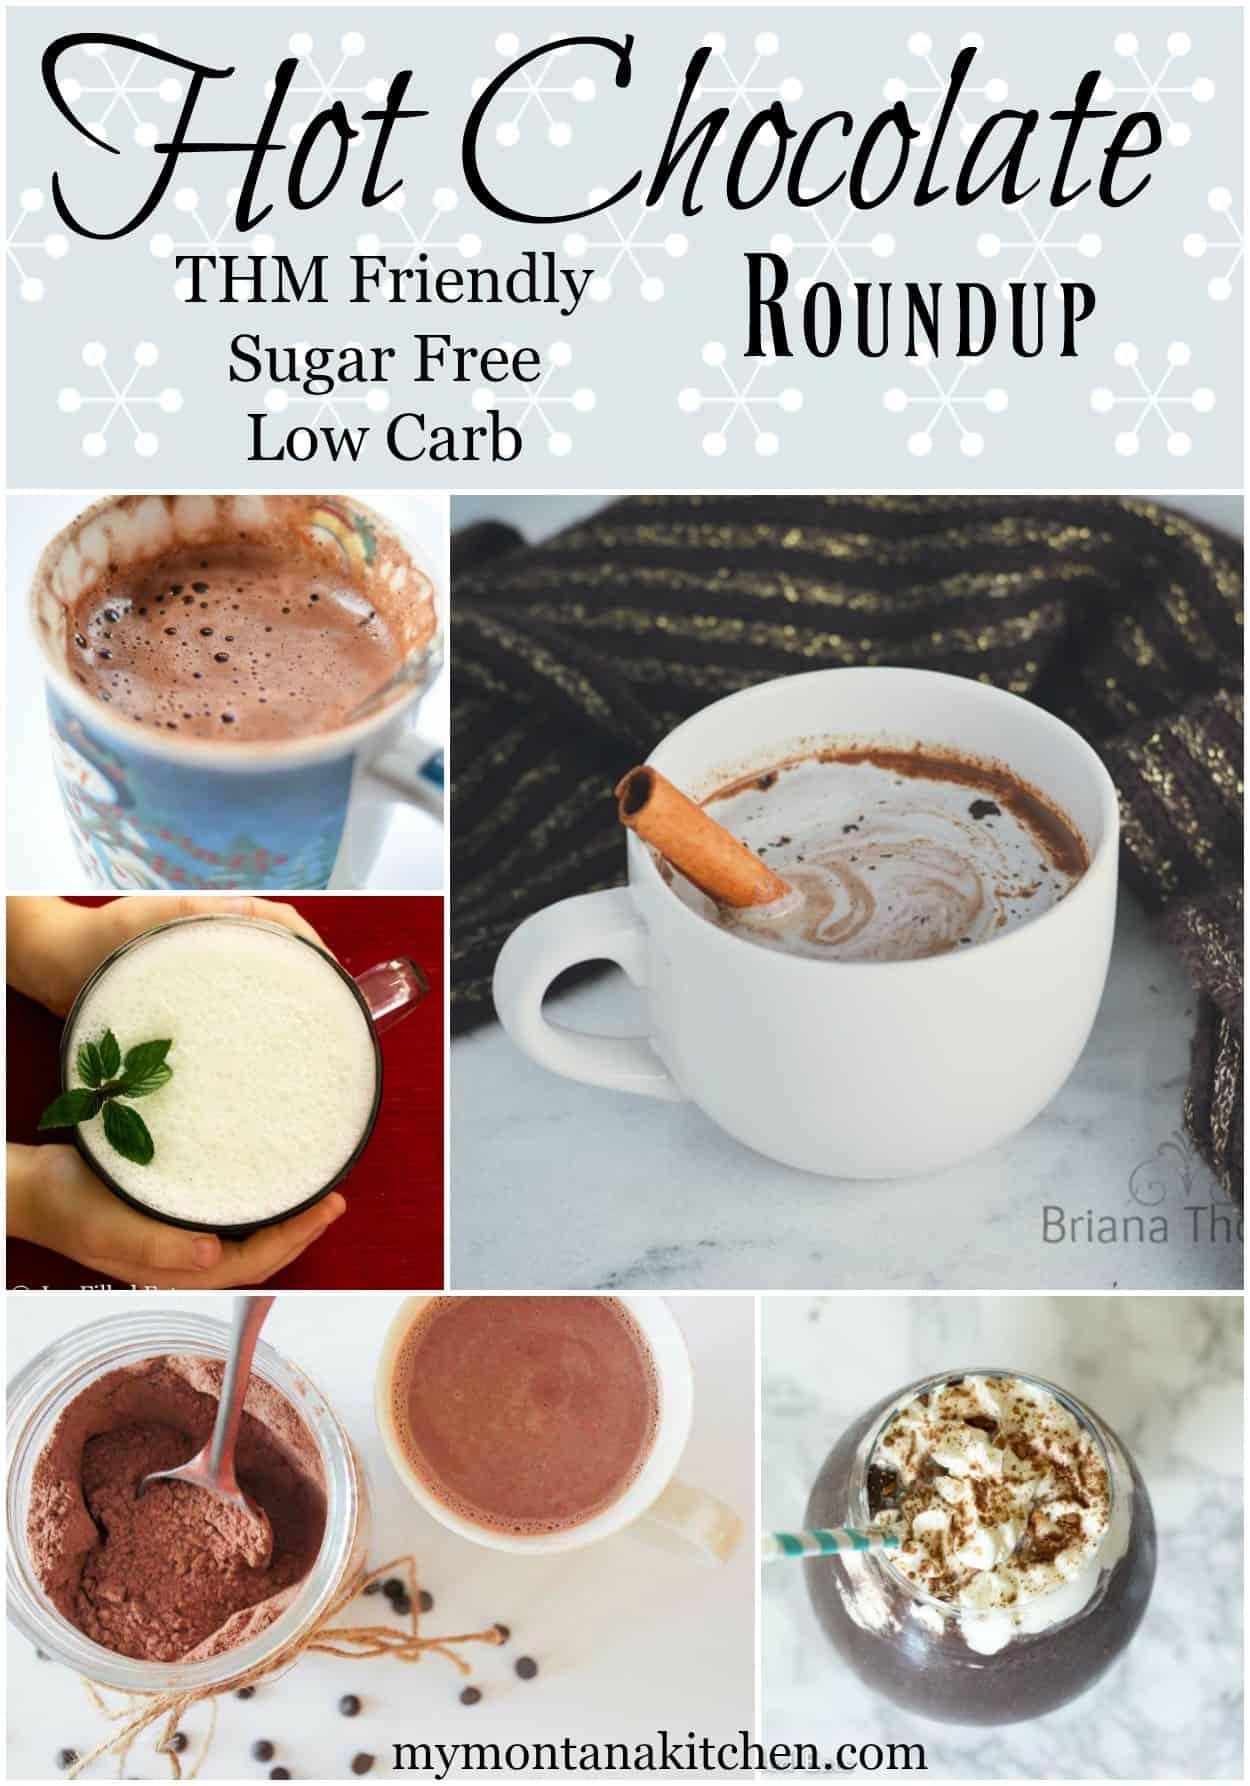 Low Carb, Sugar Free Hot Chocolate Roundup - My Montana Kitchen